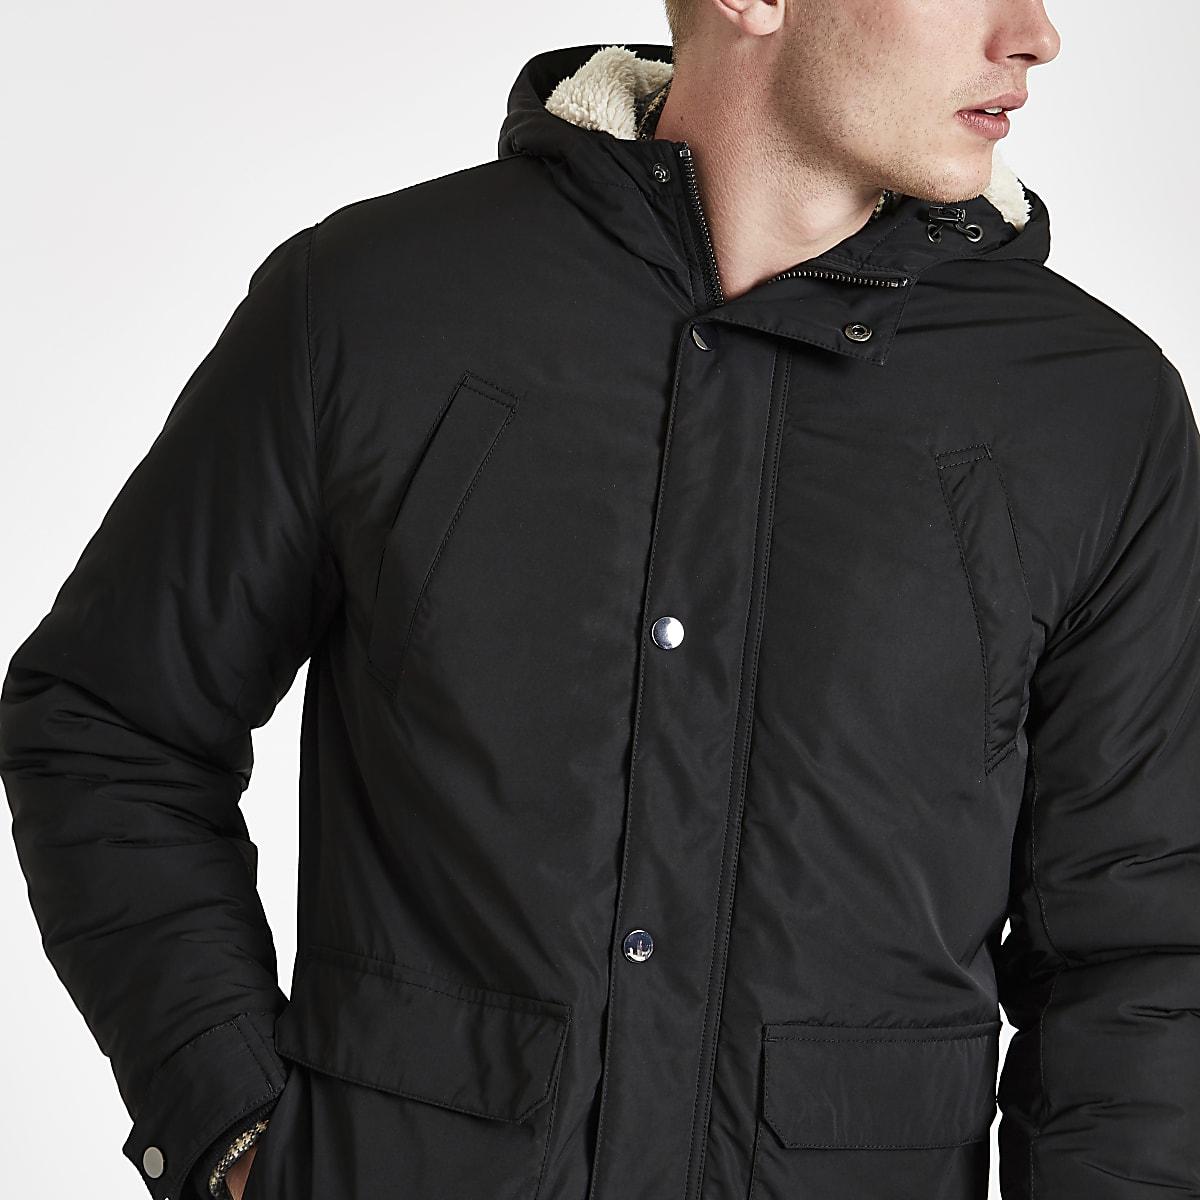 67aafd723c3f Black hooded borg lined jacket - Jackets - Coats & Jackets - men